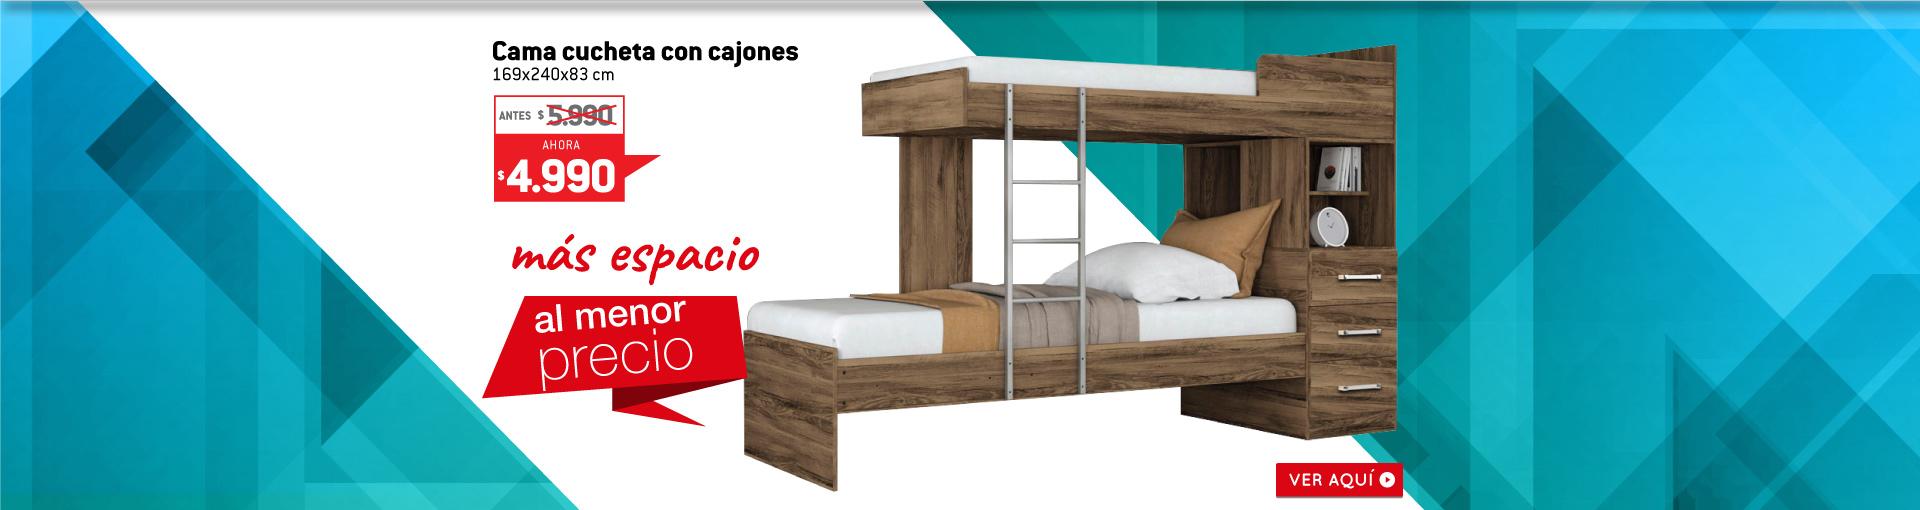 h-10-597897-cama-cucheta-con-cojones